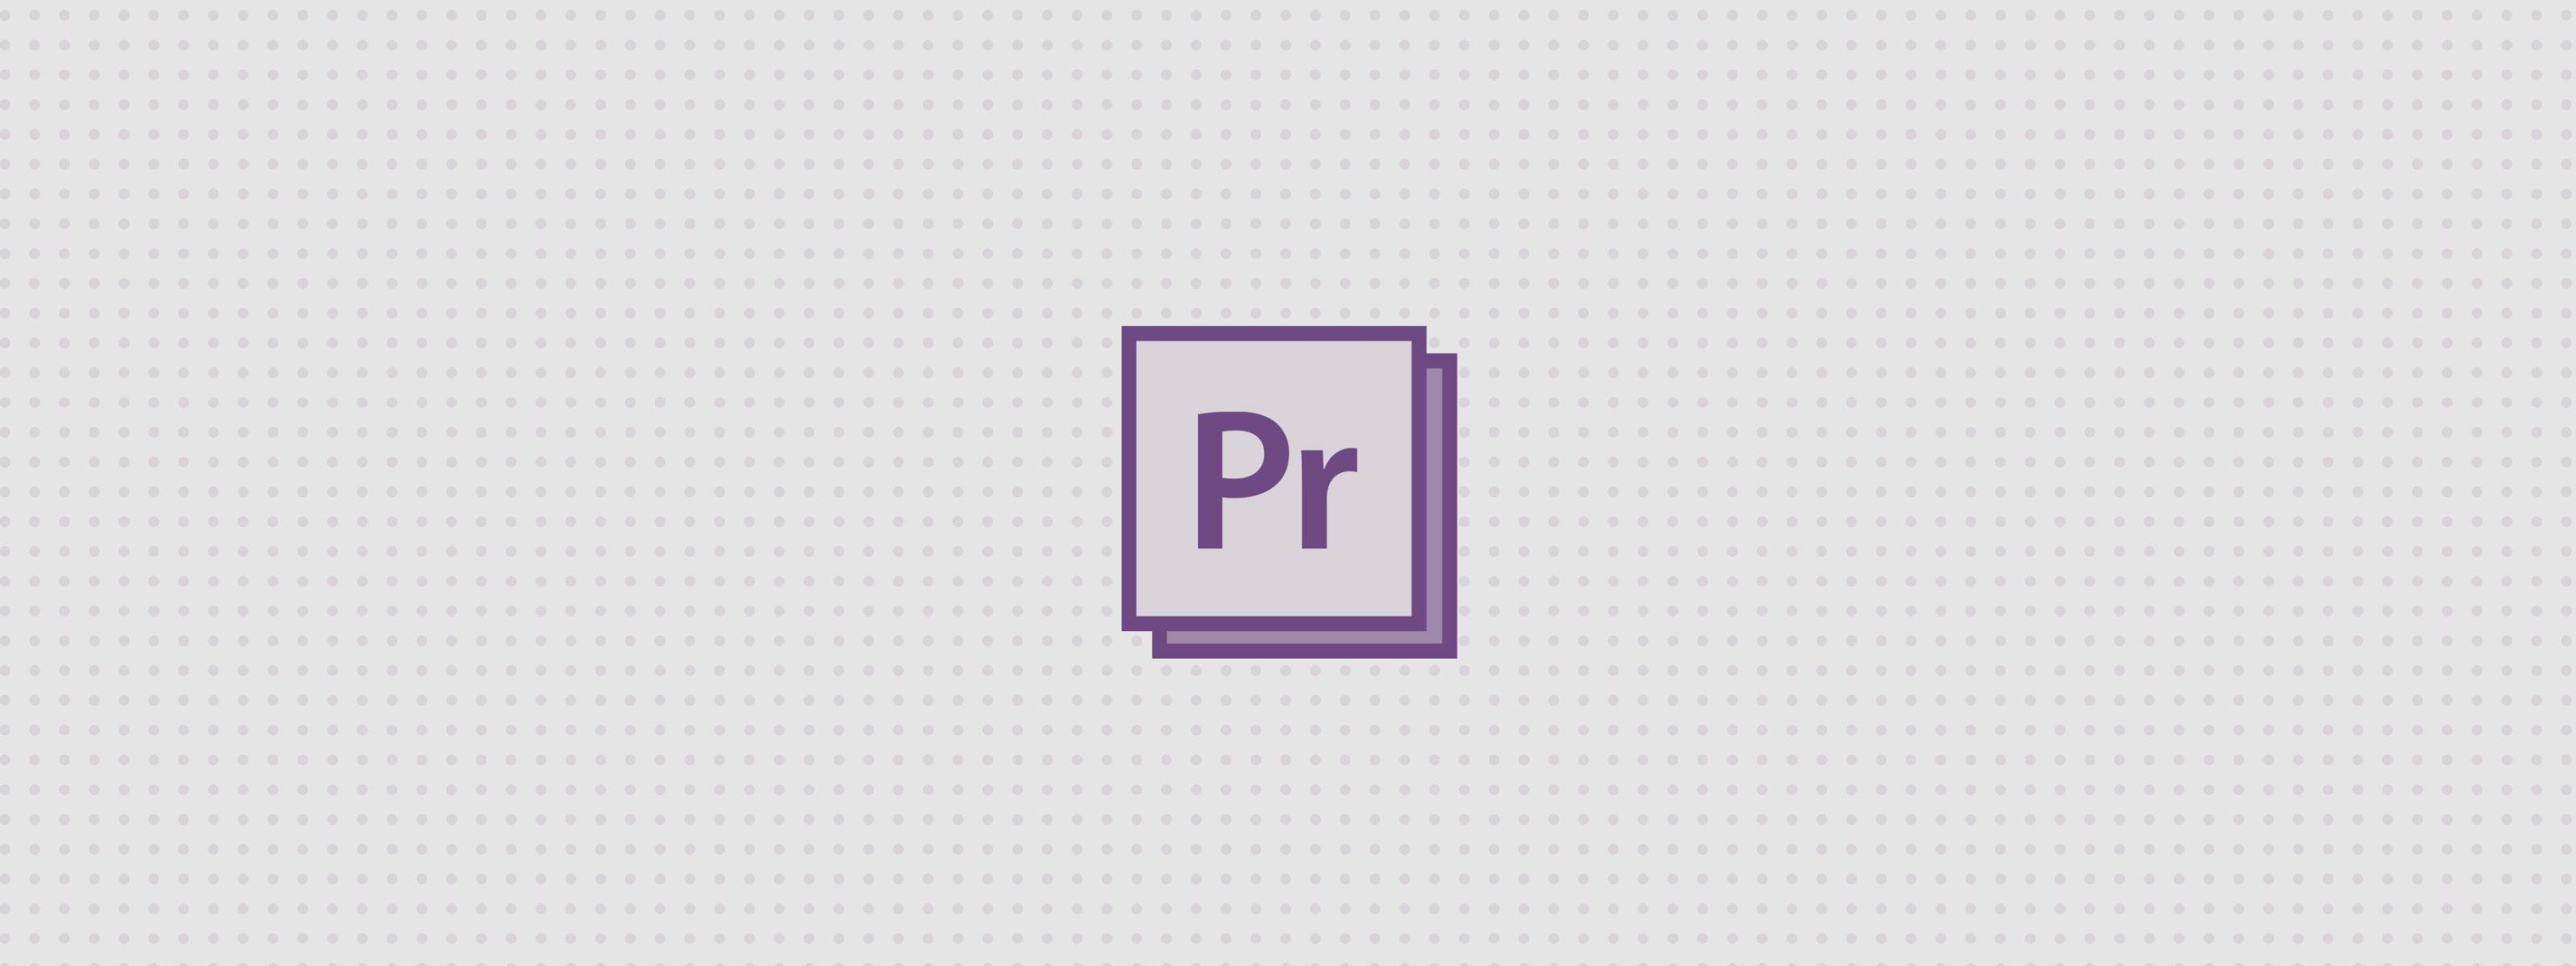 8 Free Premiere Pro Templates & Presets | Motion Array